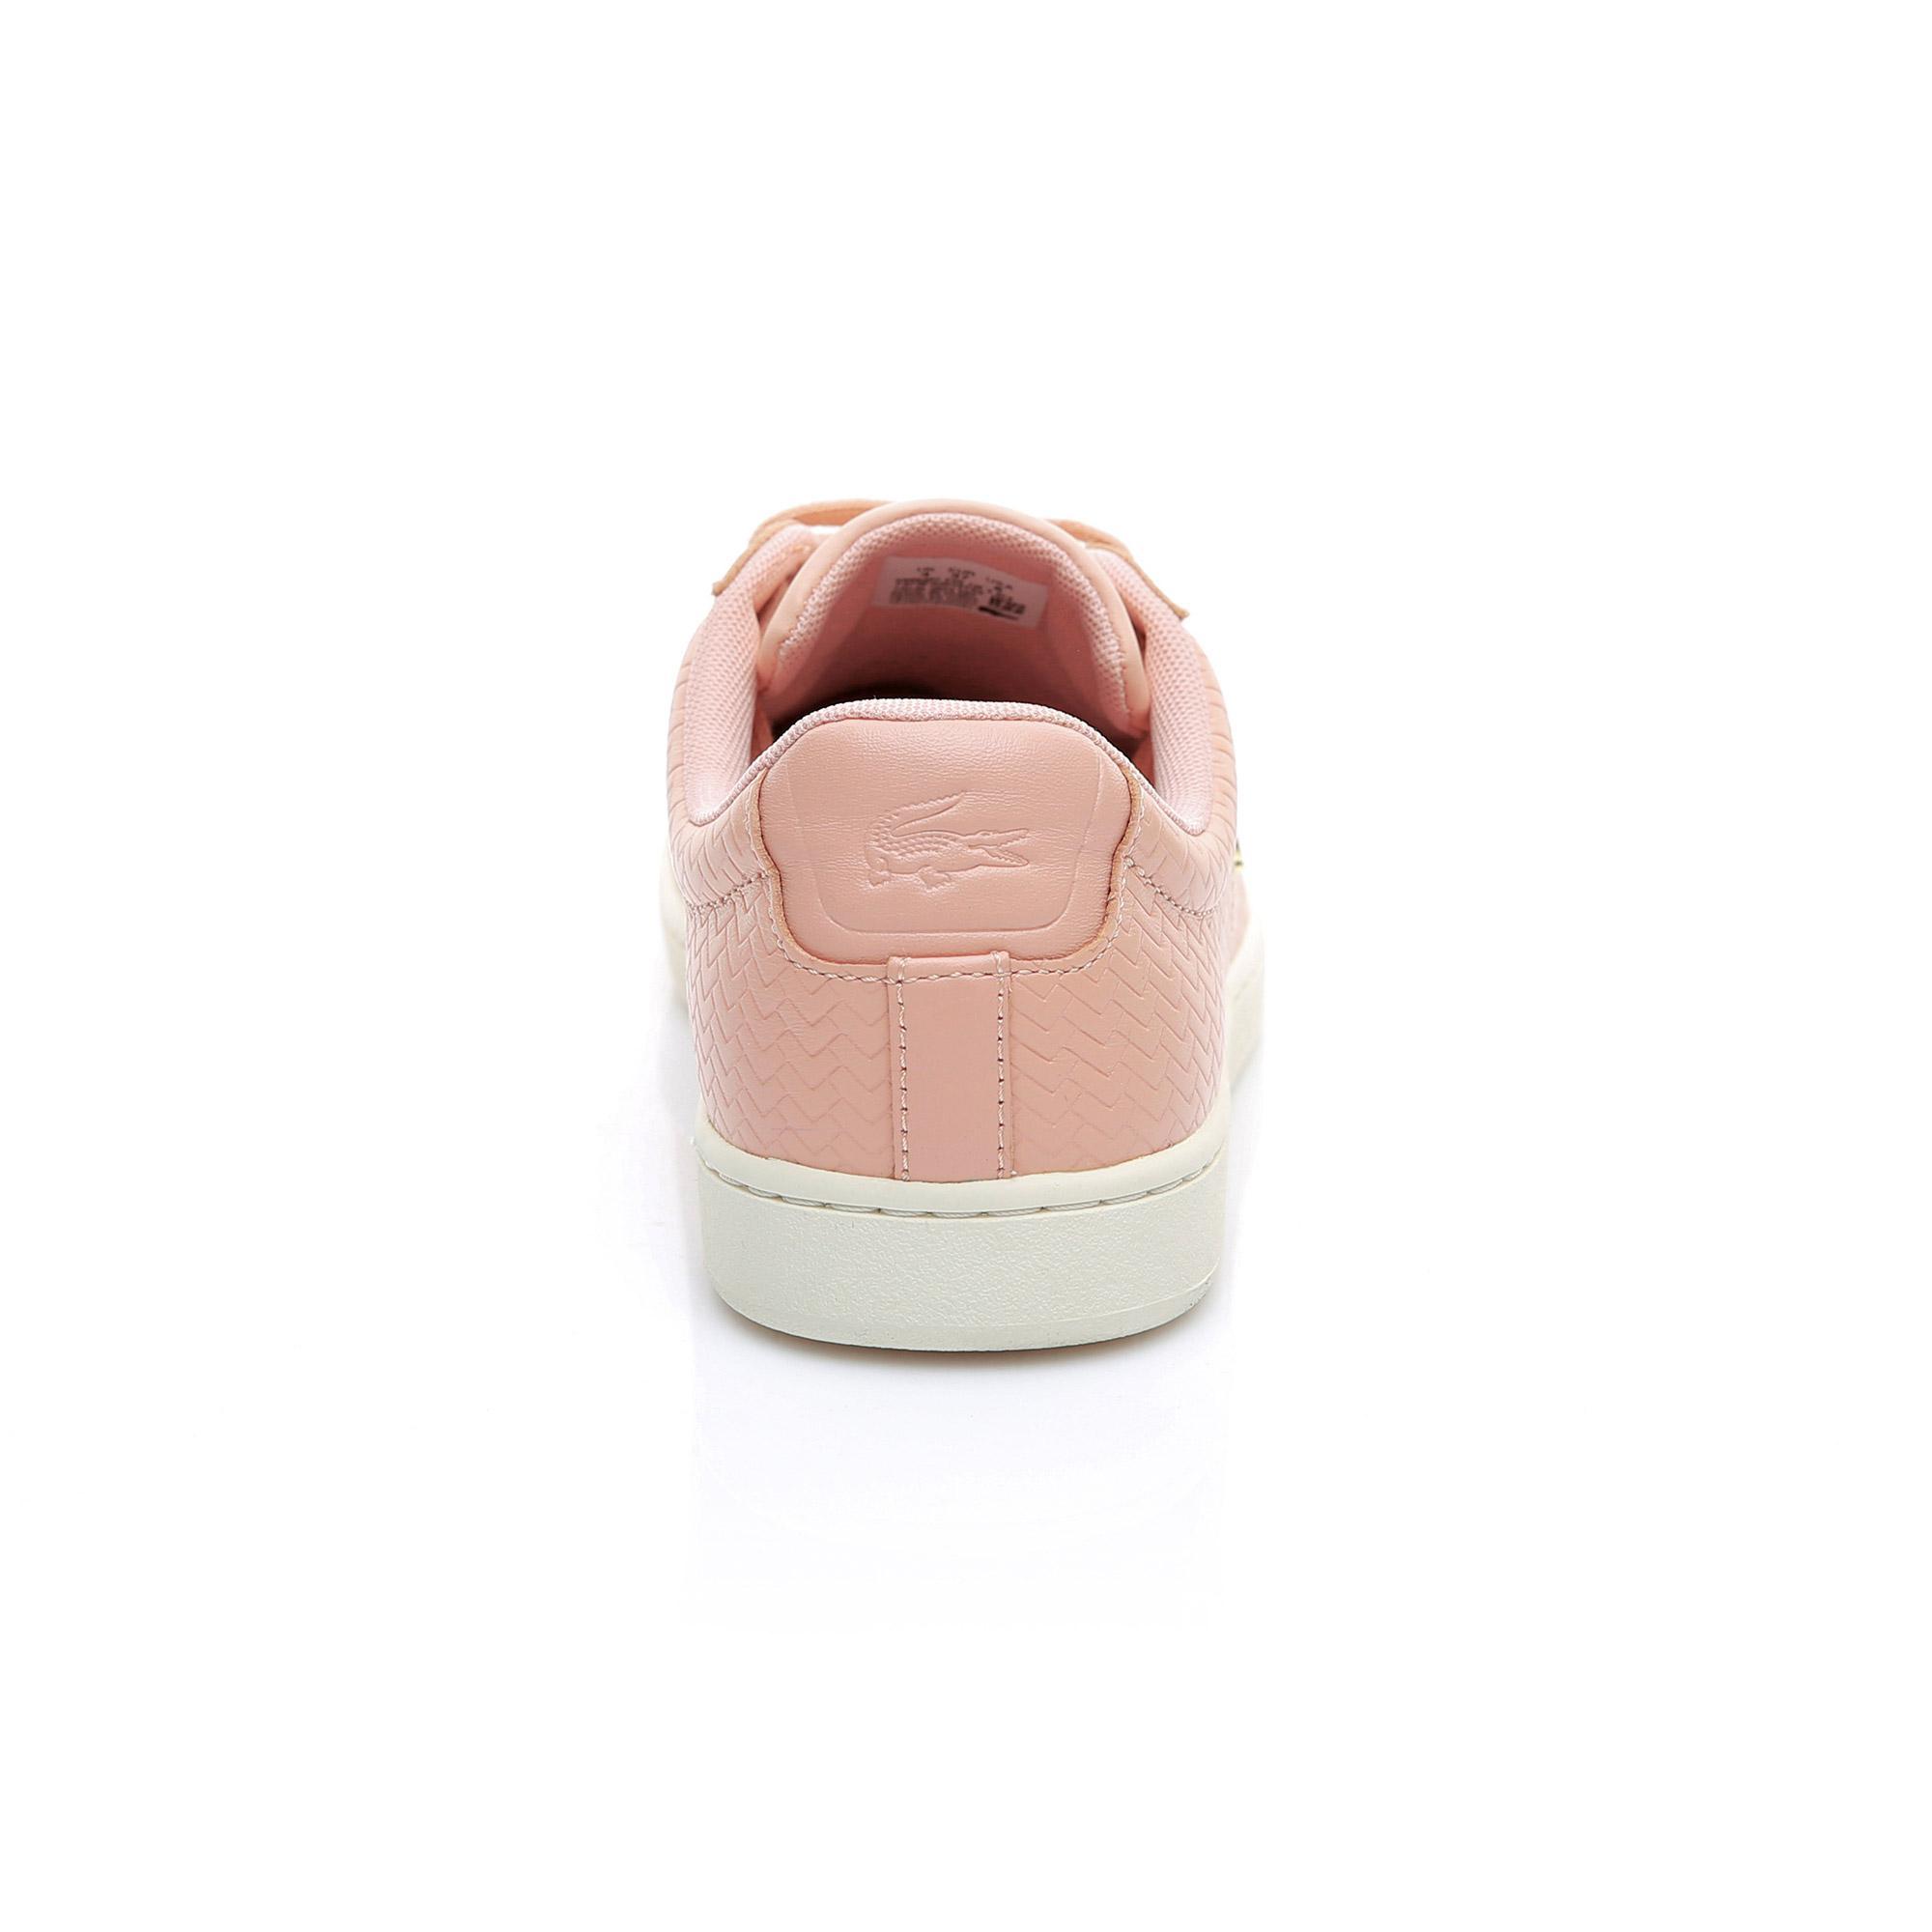 Lacoste Carnaby Evo 119 3 Damskie Sneakersy